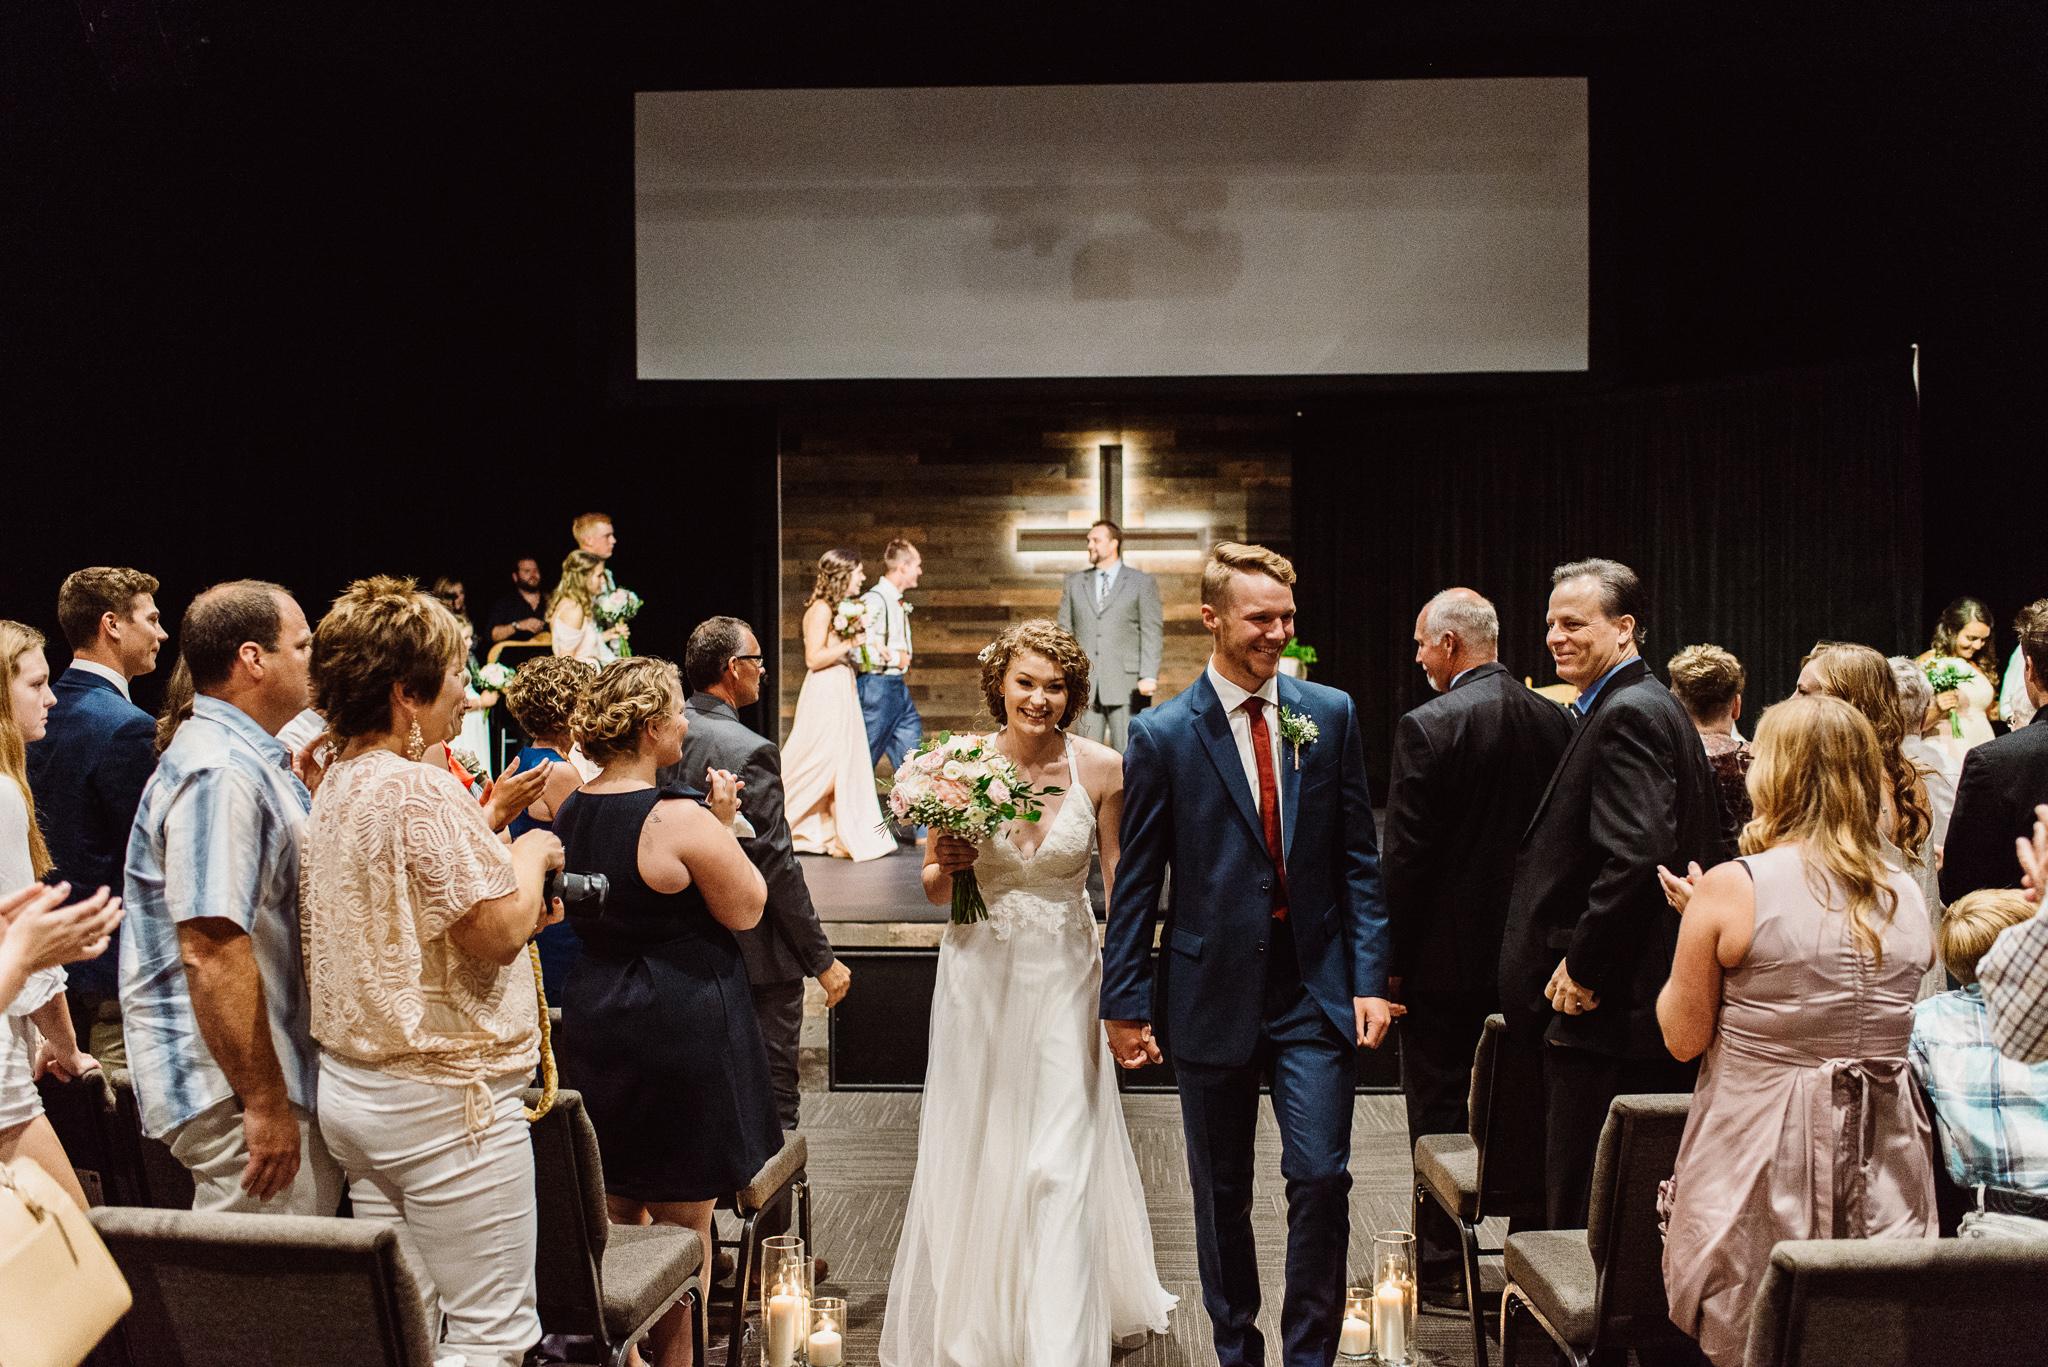 J&C-Weddingblog-137.jpg